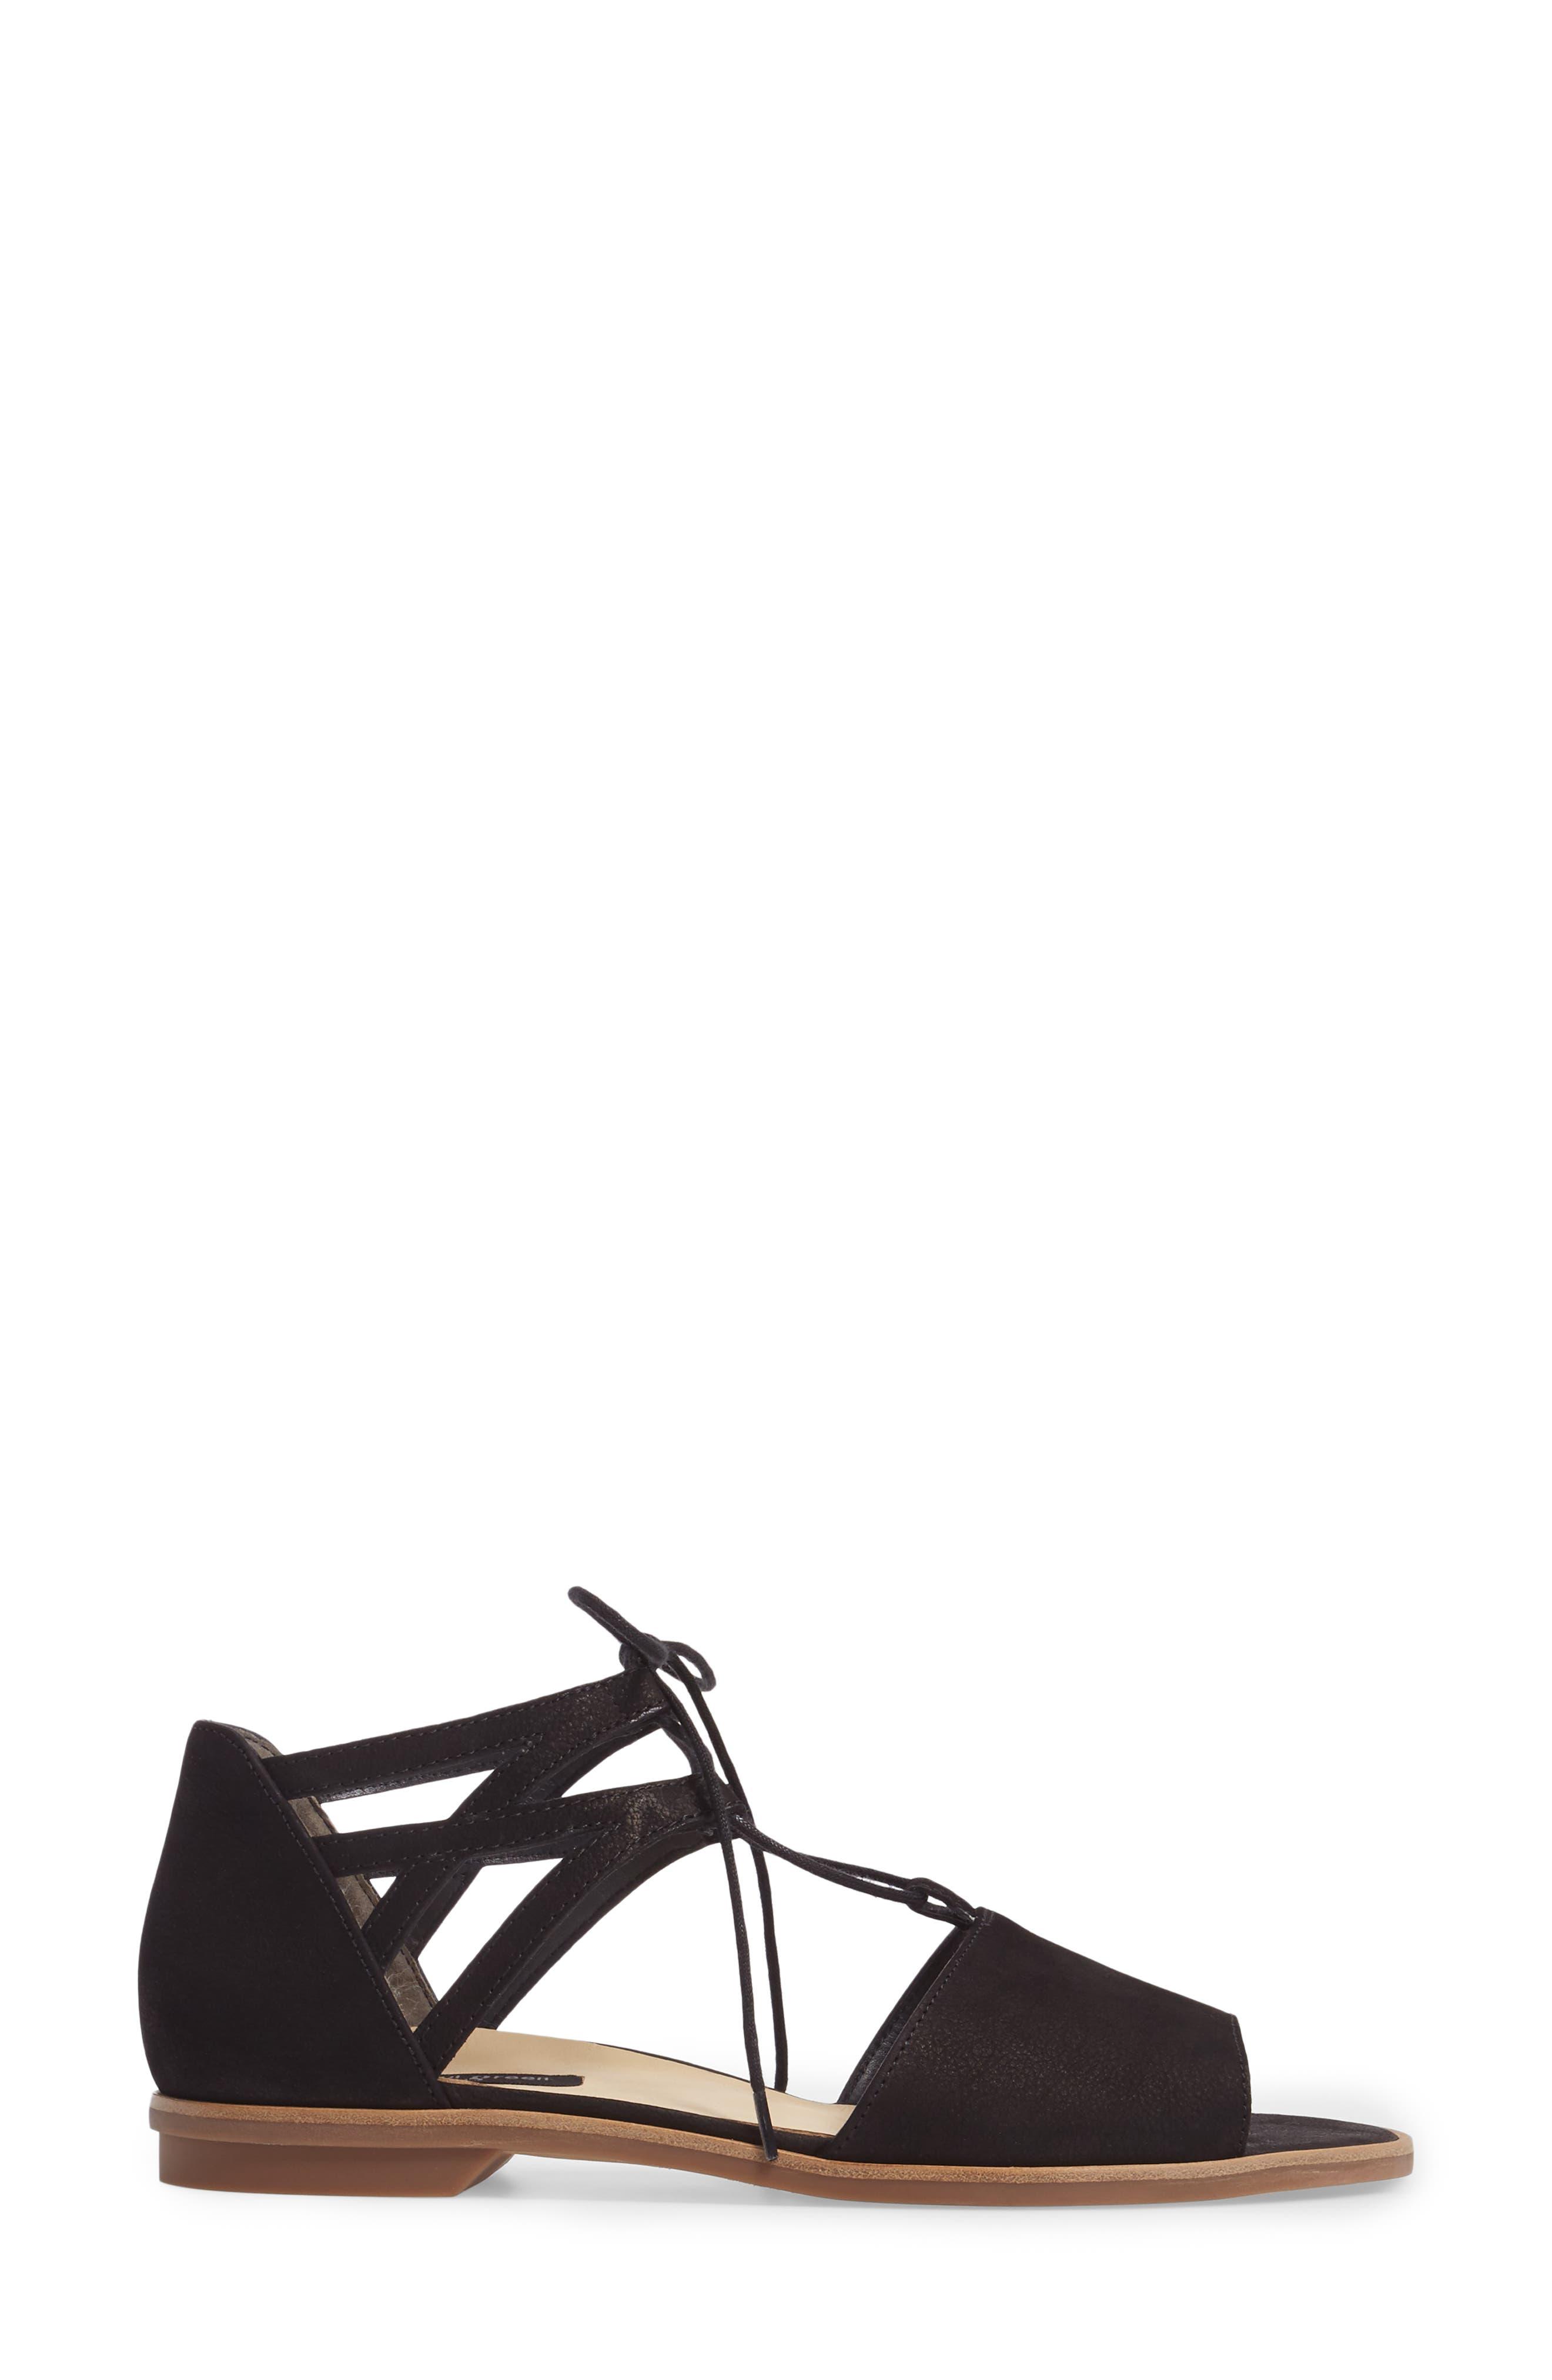 PAUL GREEN, Morea Lace-Up Sandal, Alternate thumbnail 3, color, BLACK LEATHER